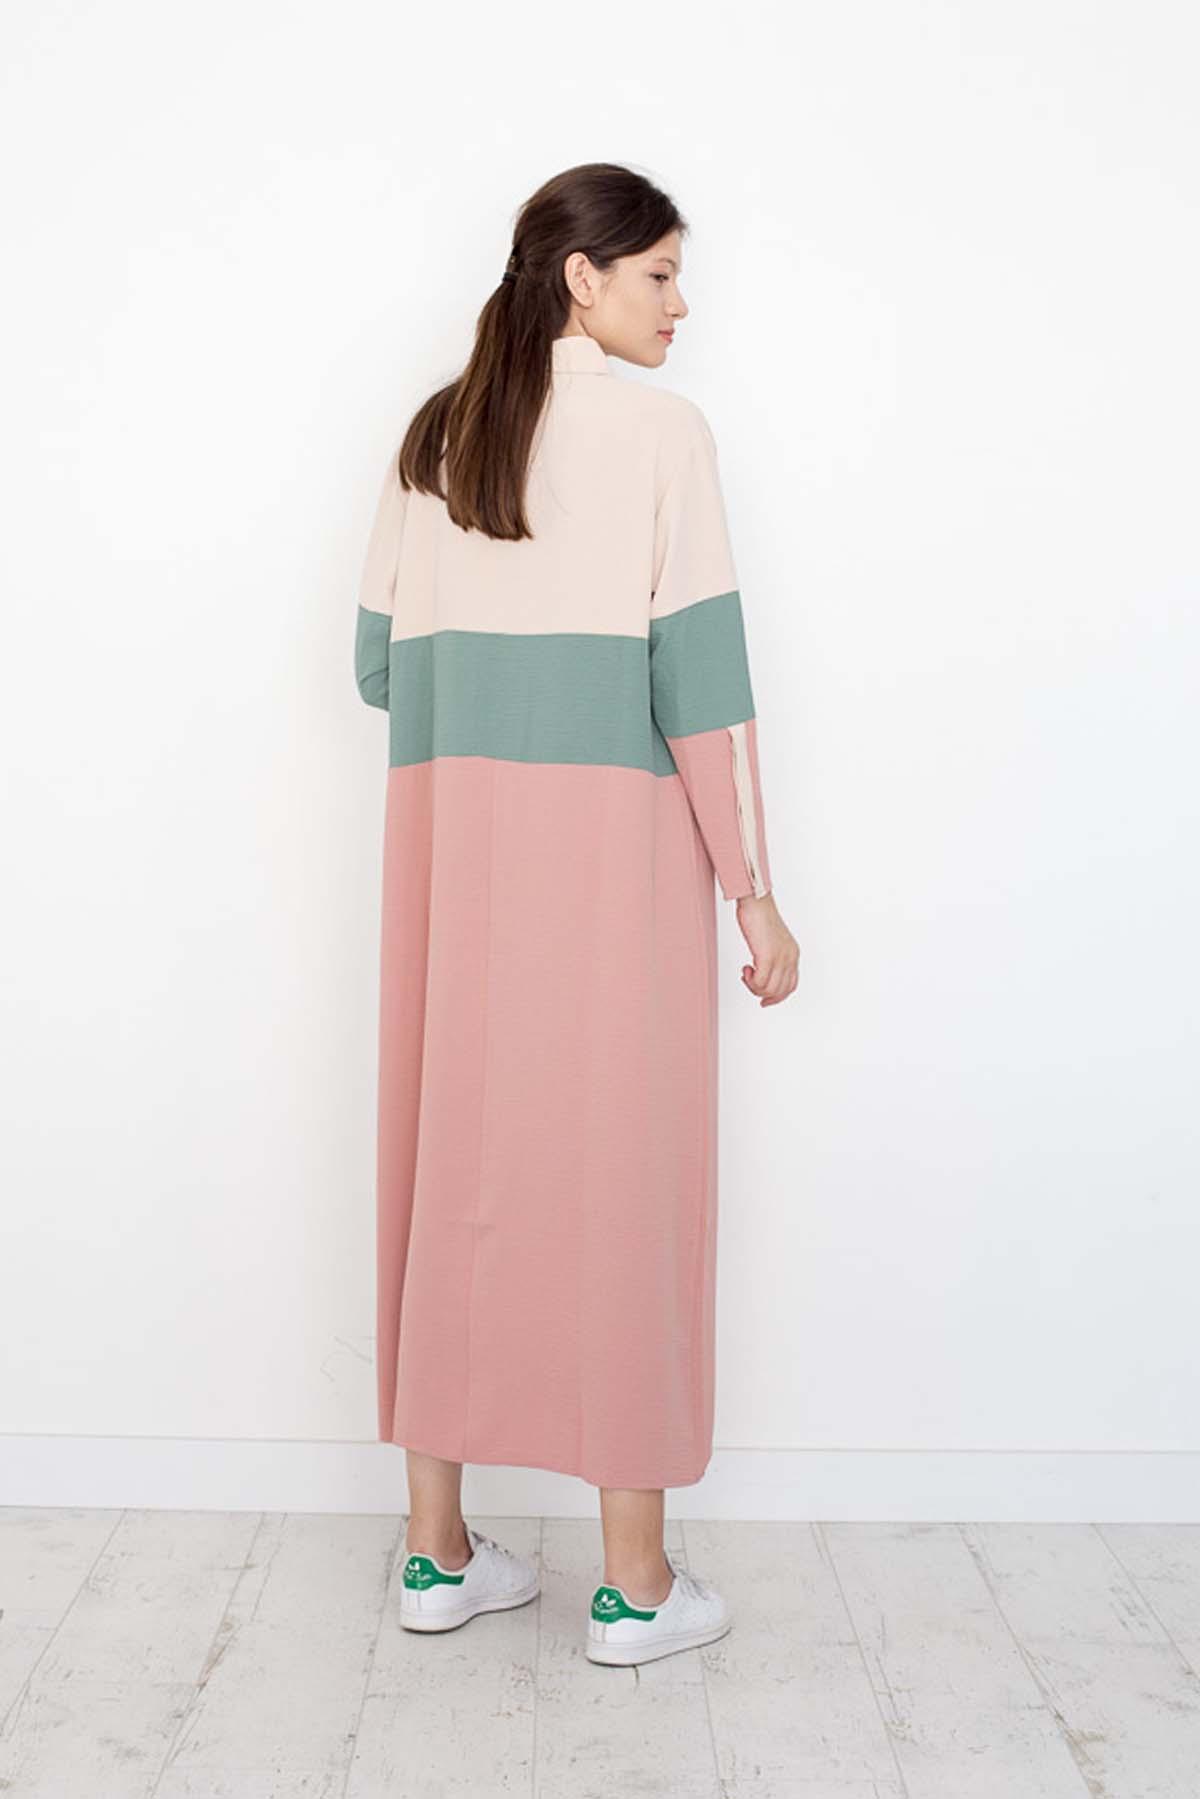 Mevra - Blok Elbise Bej Mint Pudra